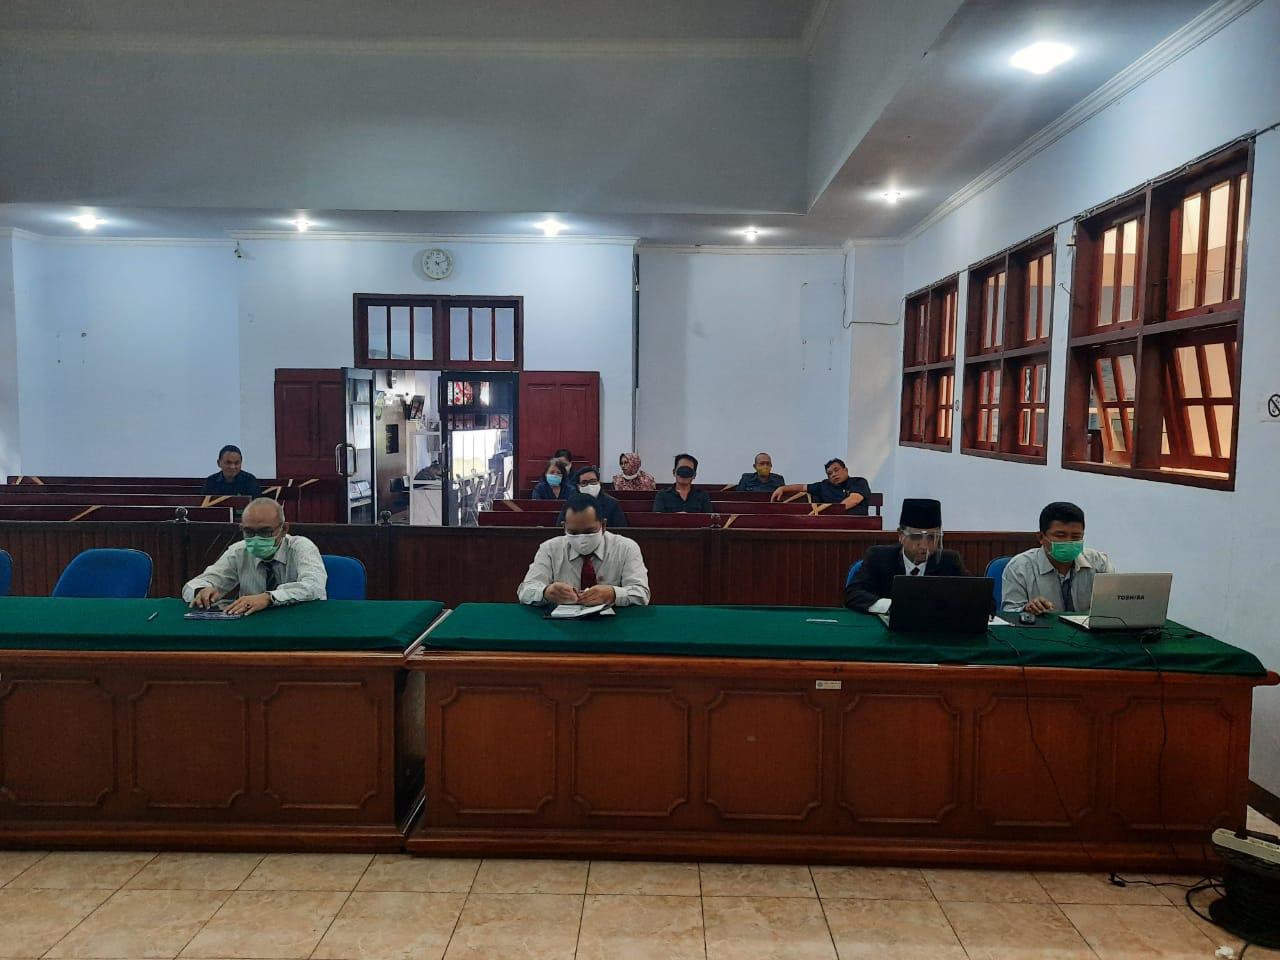 Launching Virtual Direktori Putusan Versi 3 dan Penyerahan Anugerah Mahkamah Agung Tahun 2020 serta Dialog Interaktif